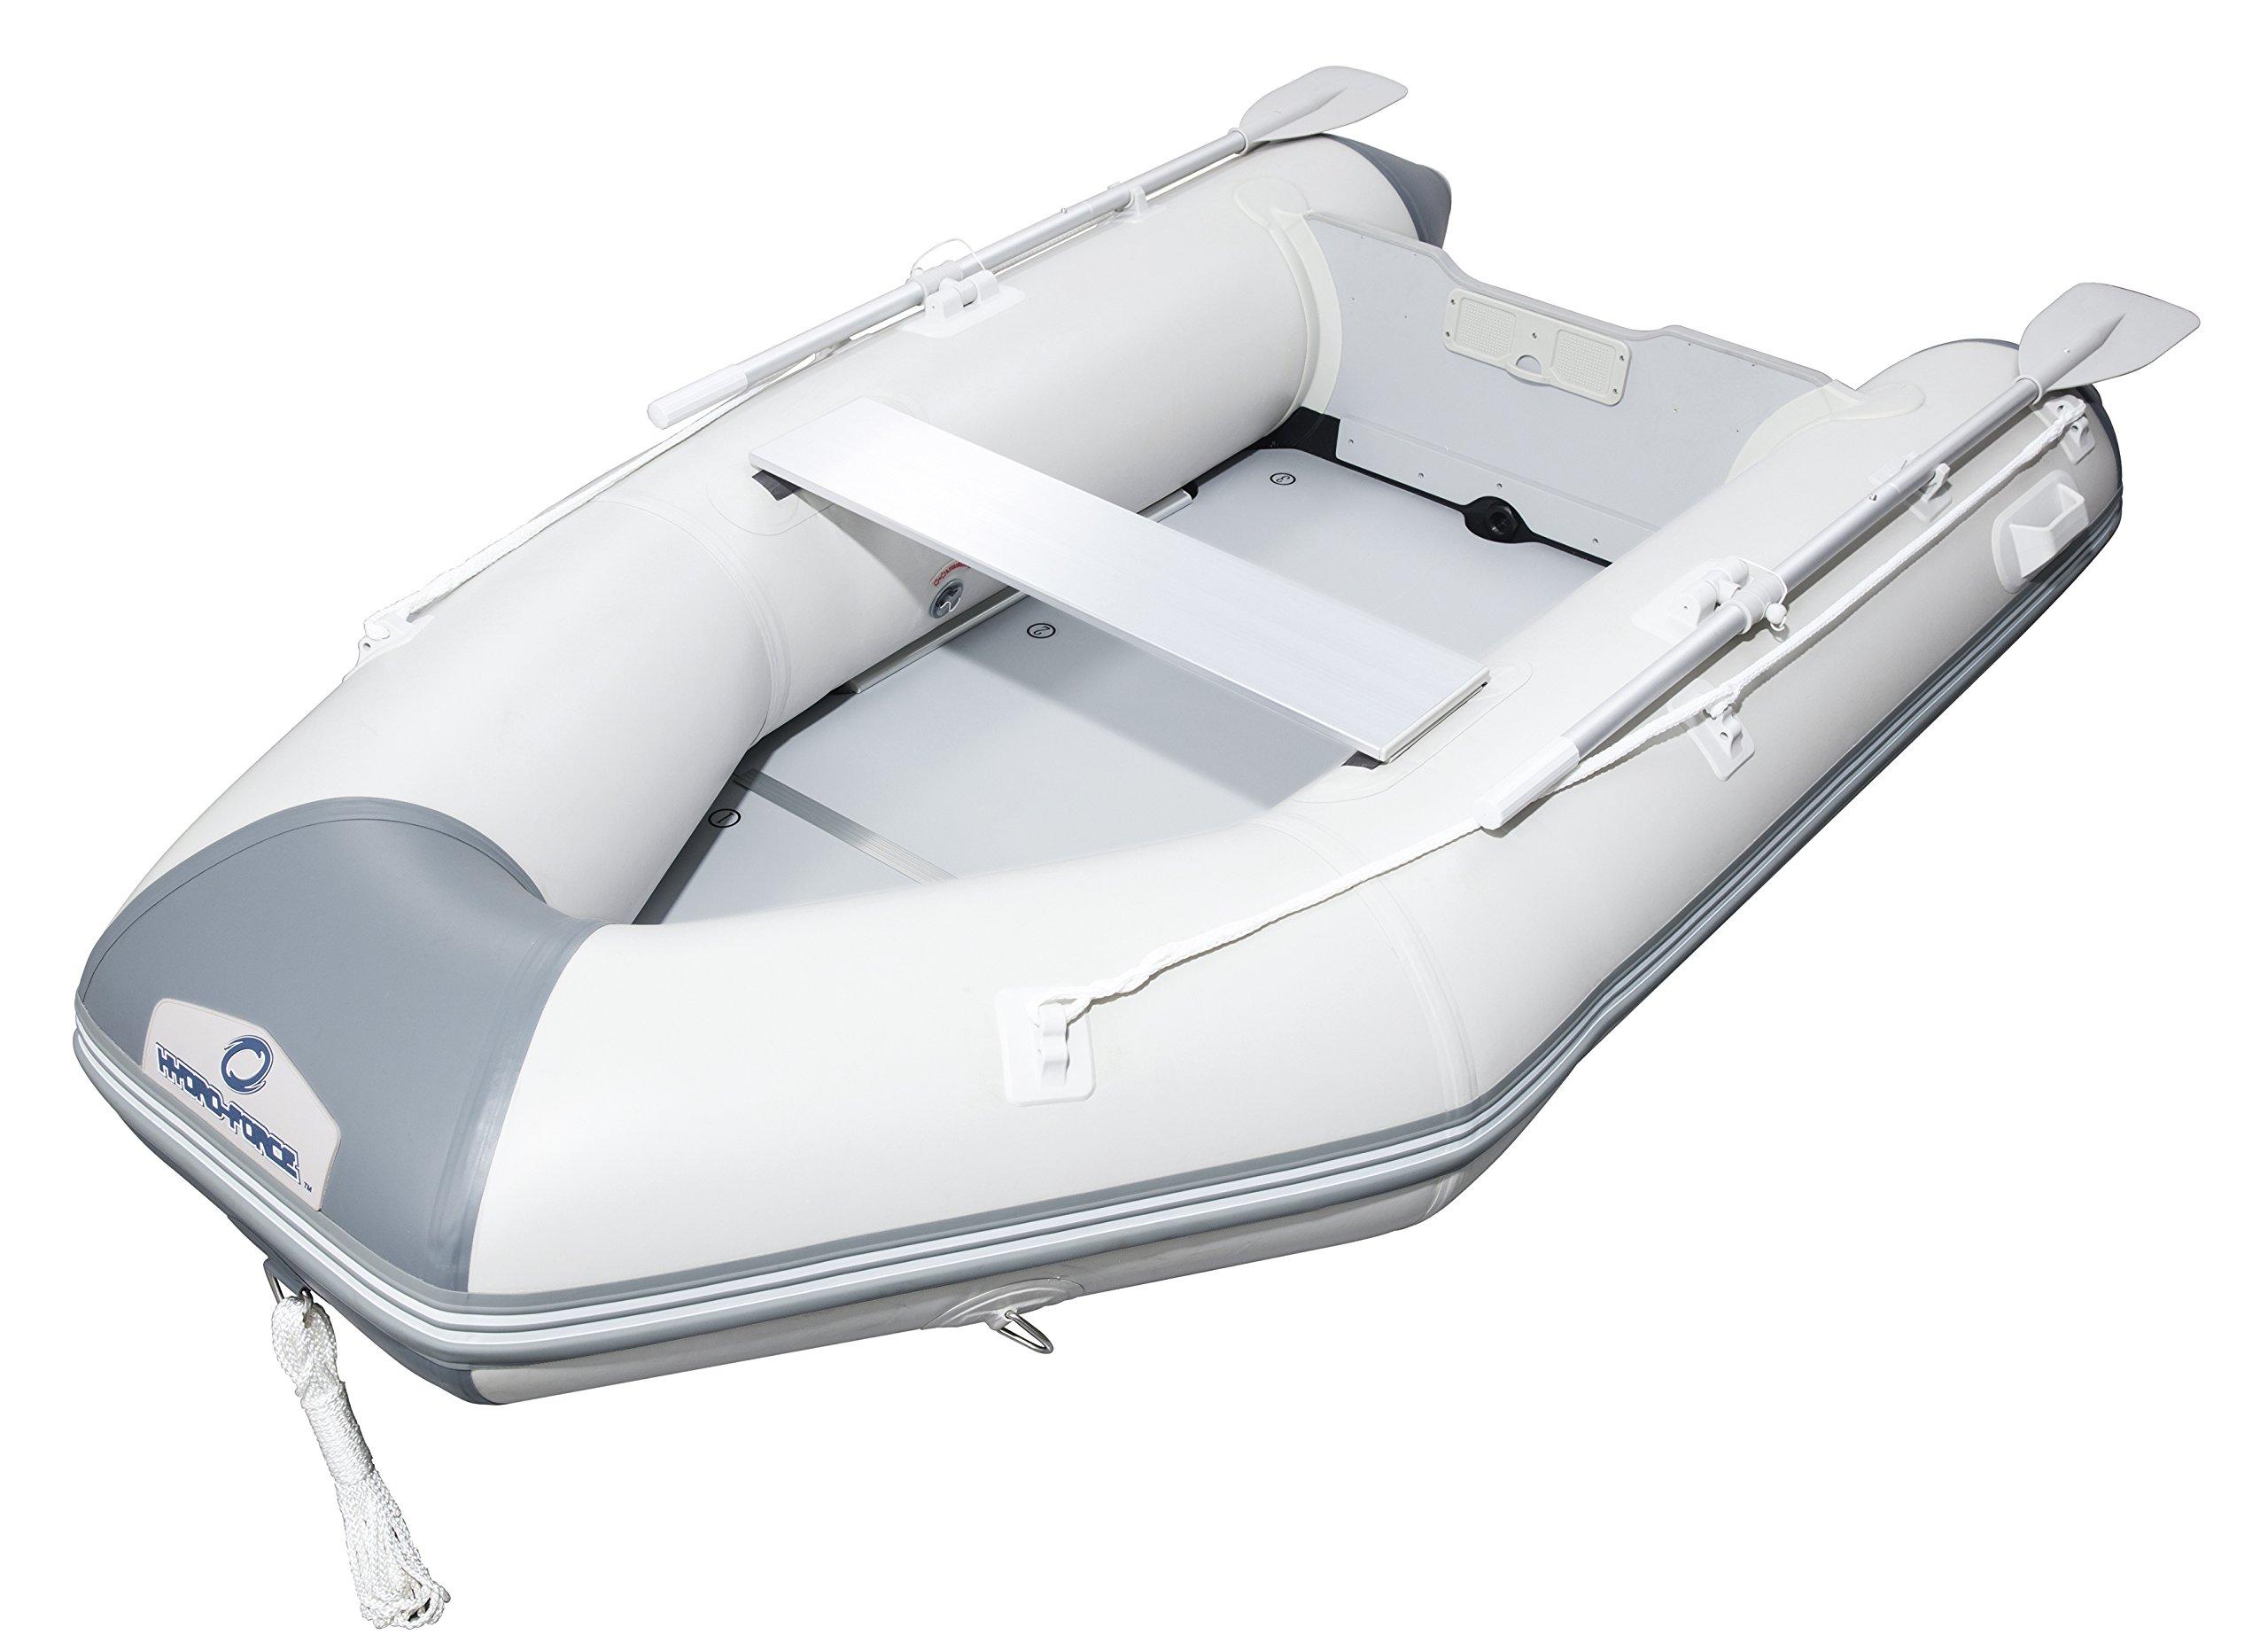 Bestway Hydro-Force Caspian 7-Feet 6-Inch RIB Inflatable Boat